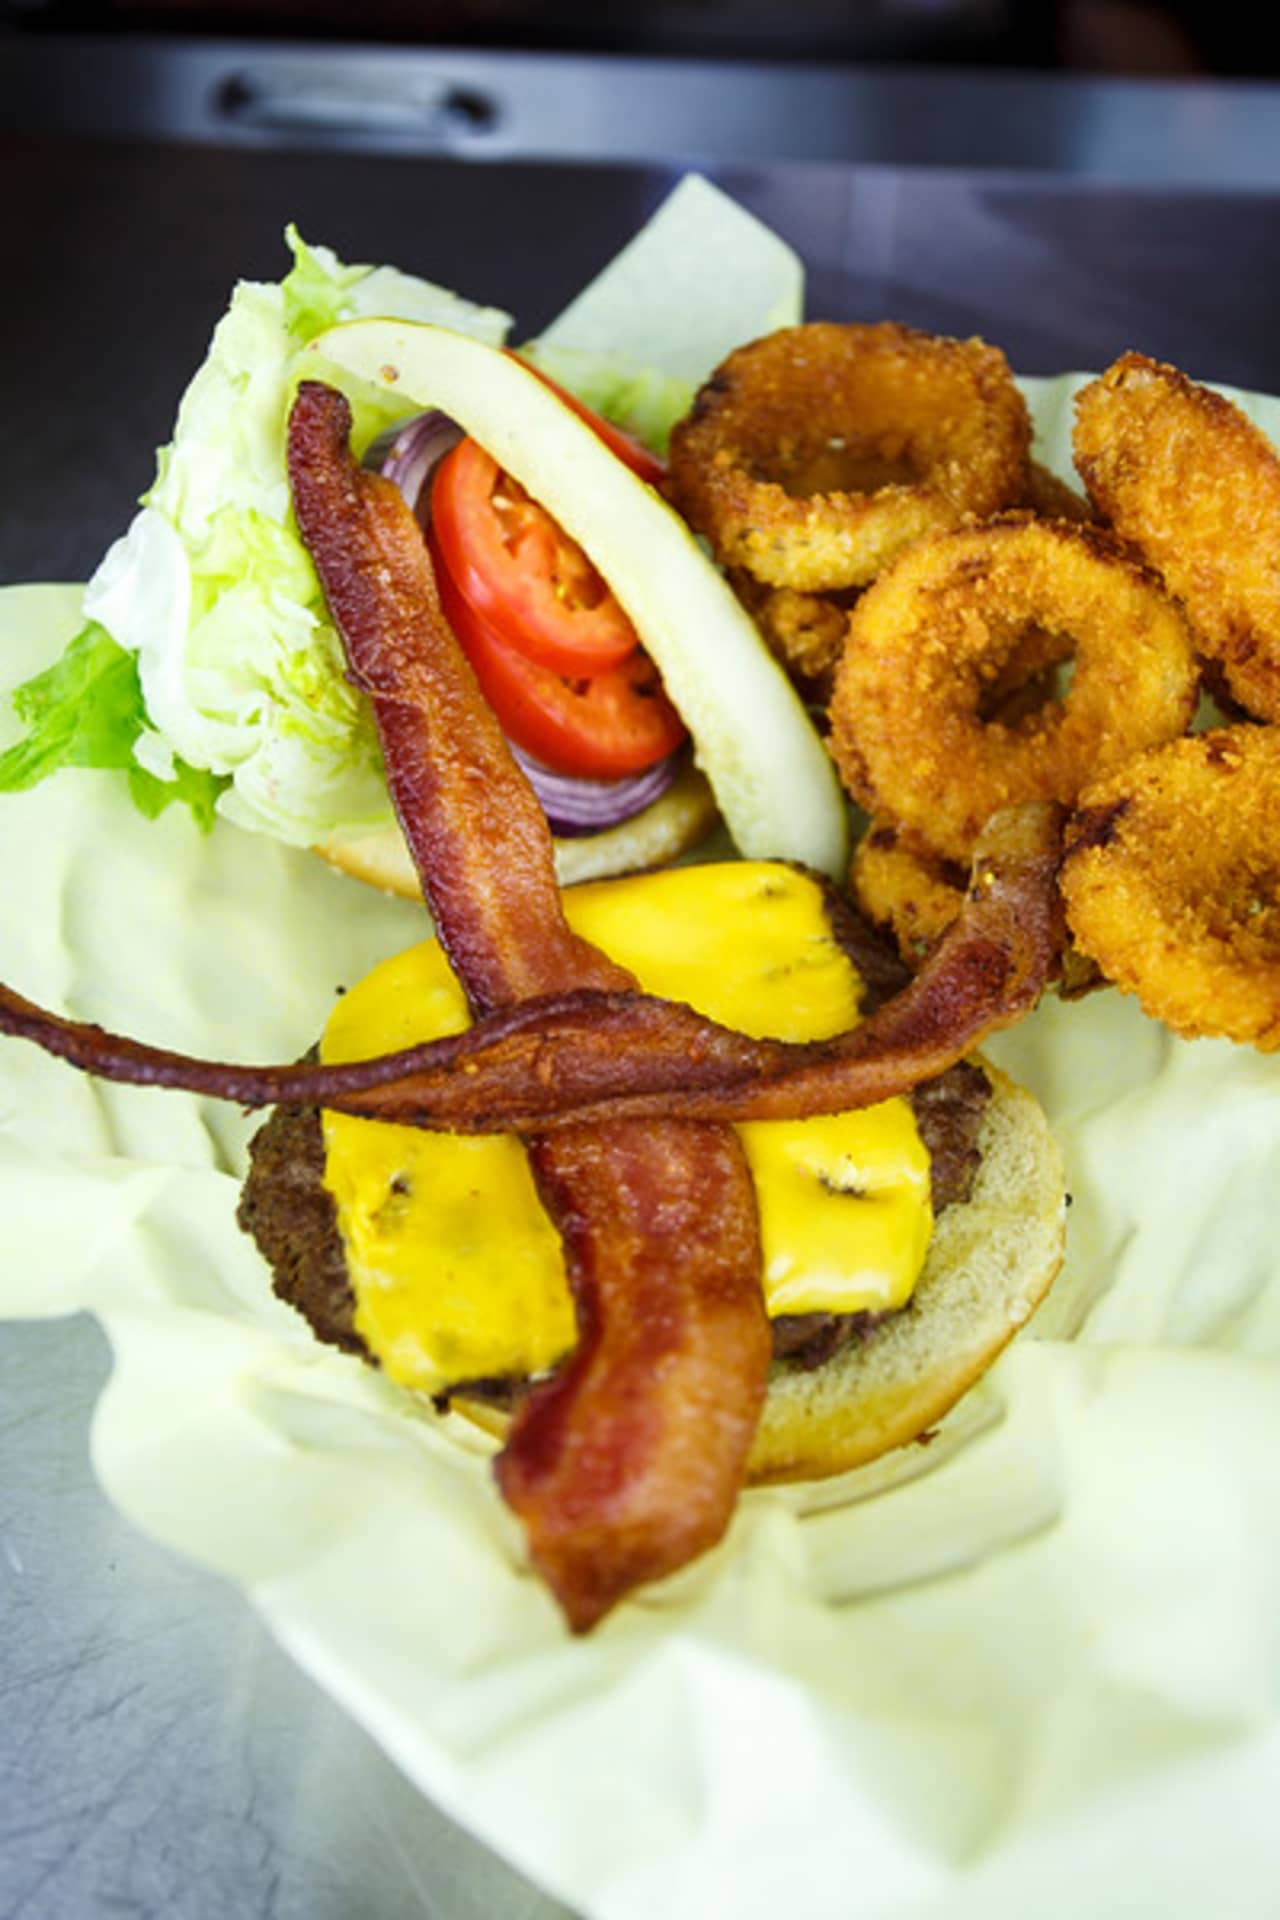 JT's ½ Pound Burger